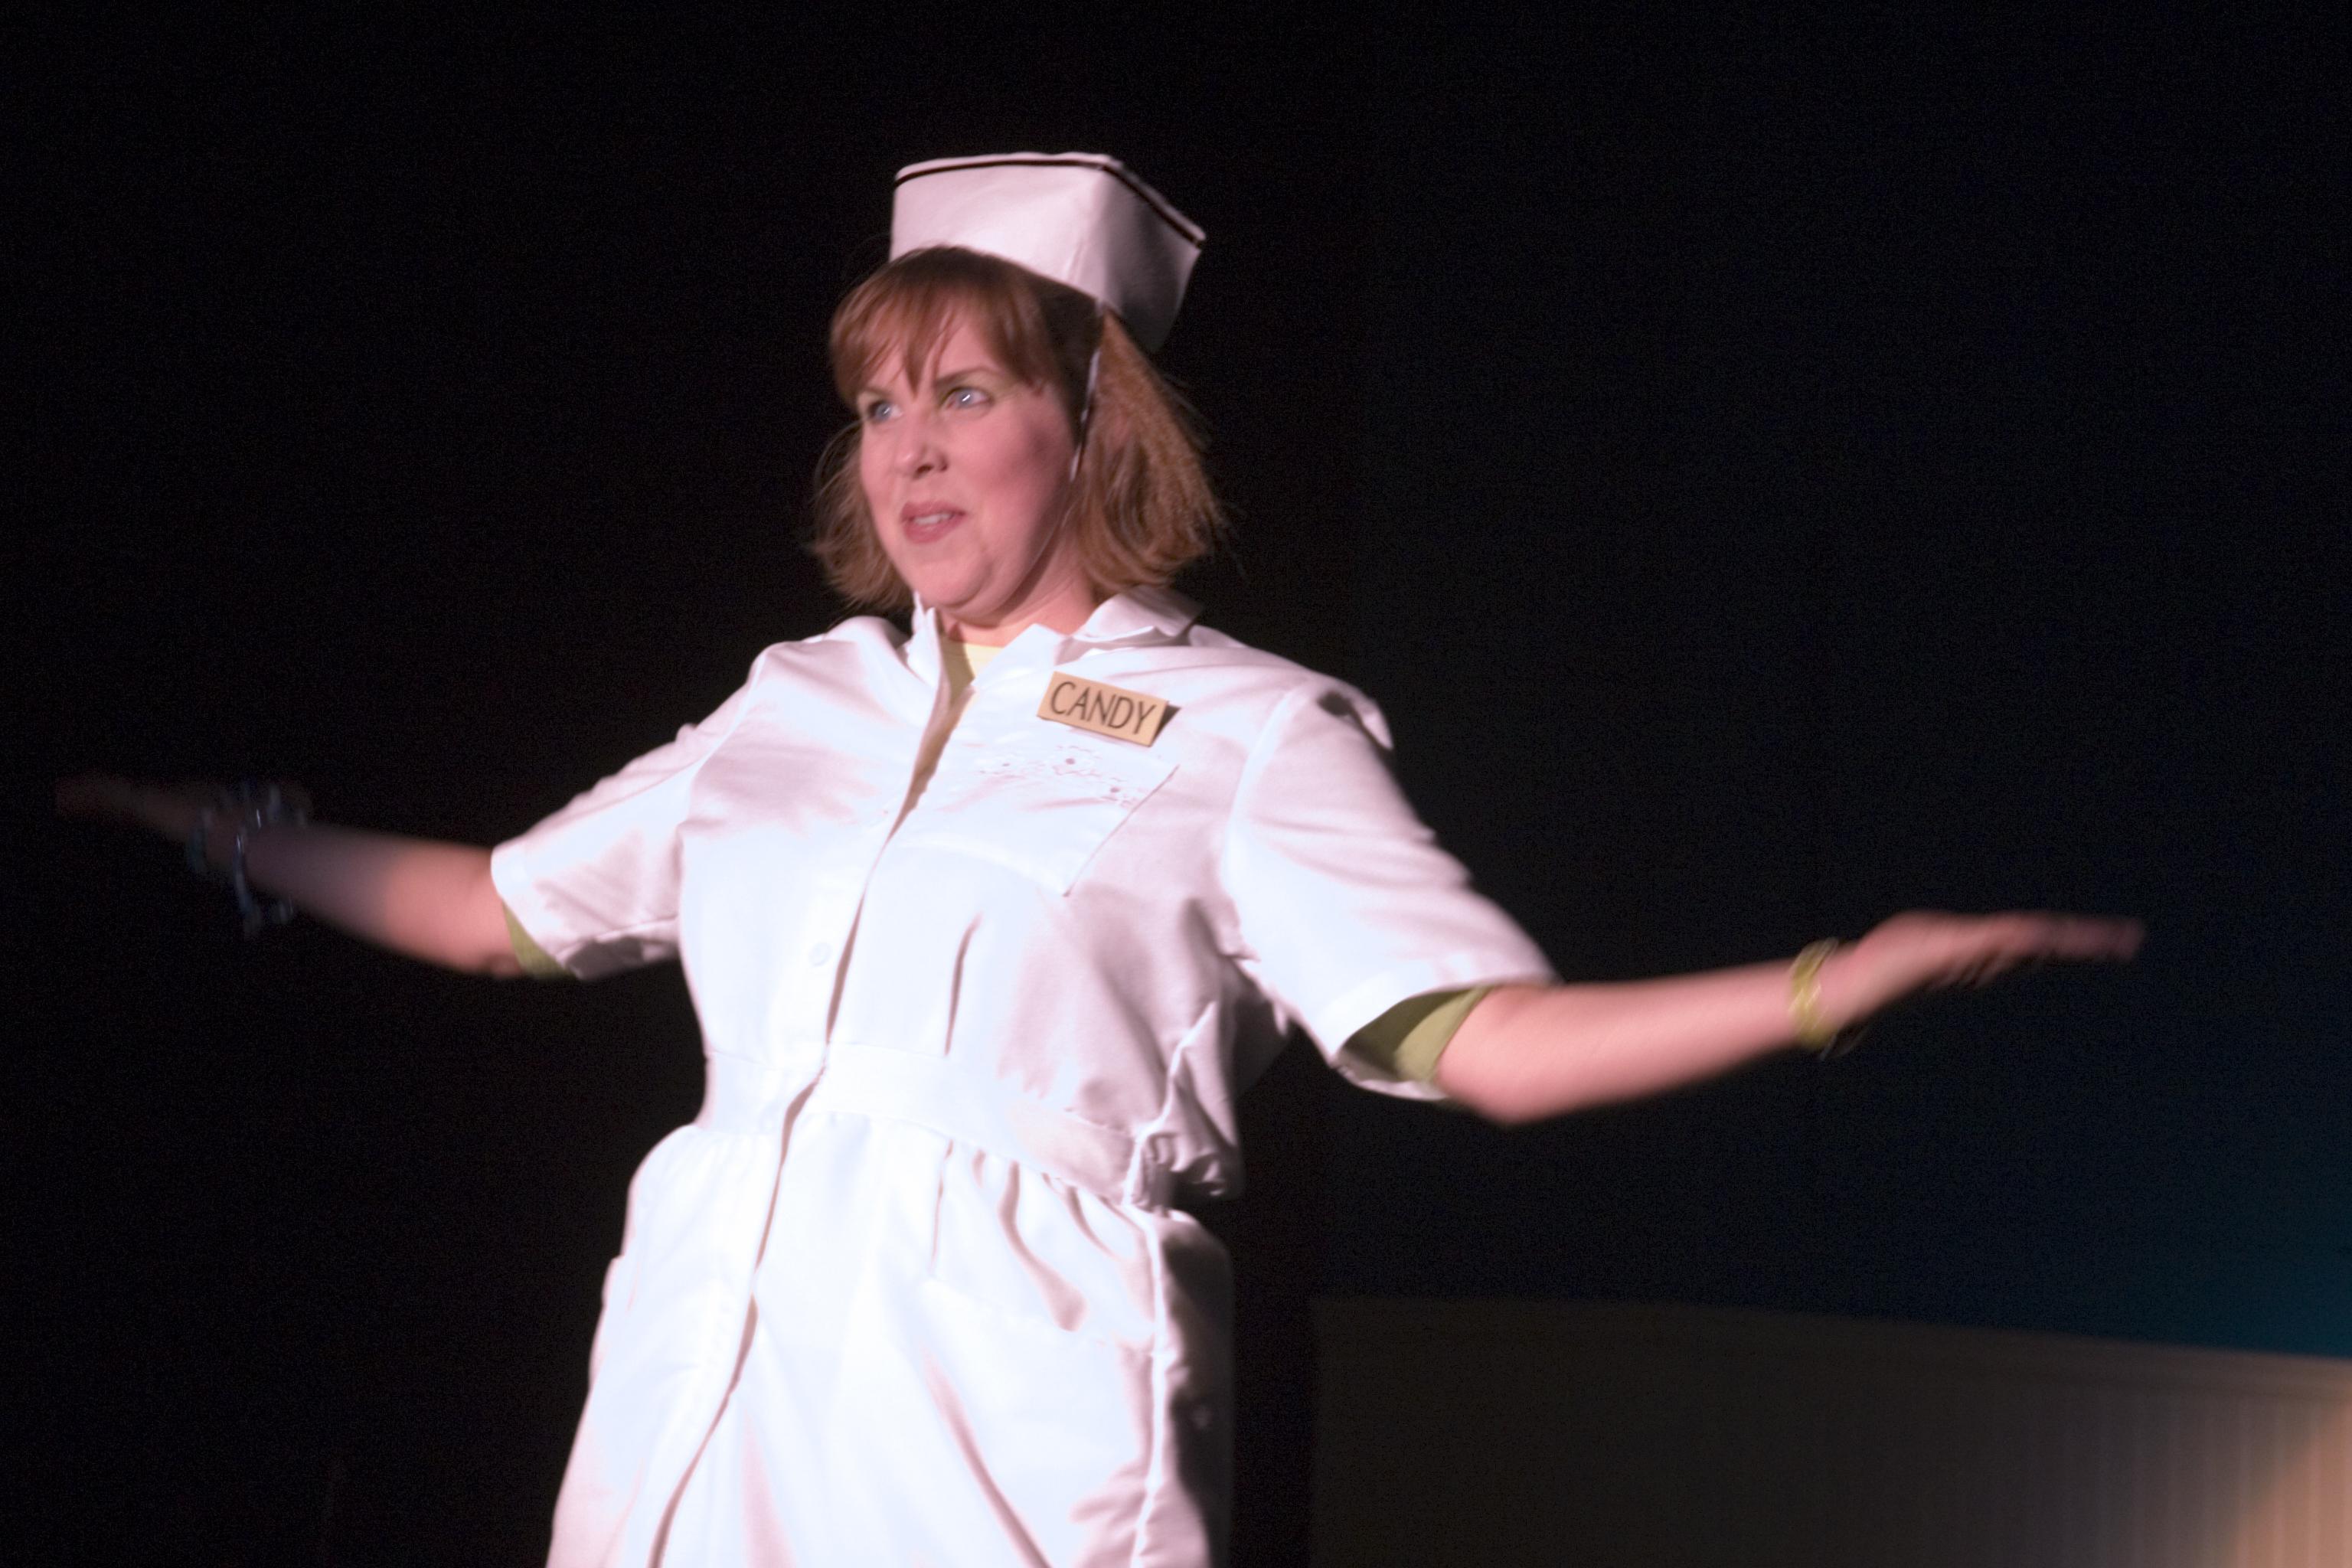 Katie powell chicago nurse dating